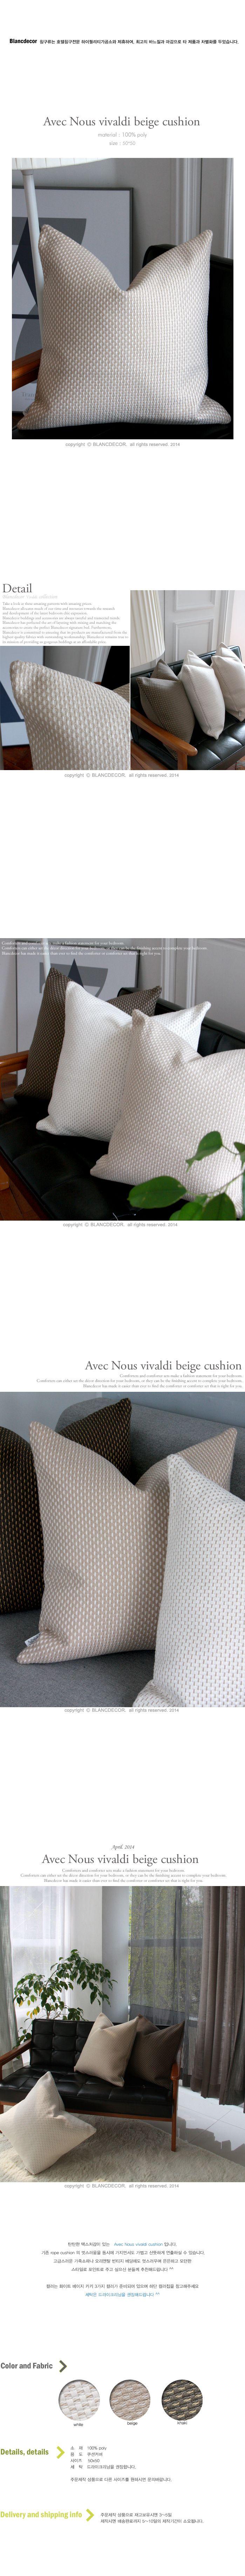 AvecNous Vivaldi beige cushion .jpg (699×7359)